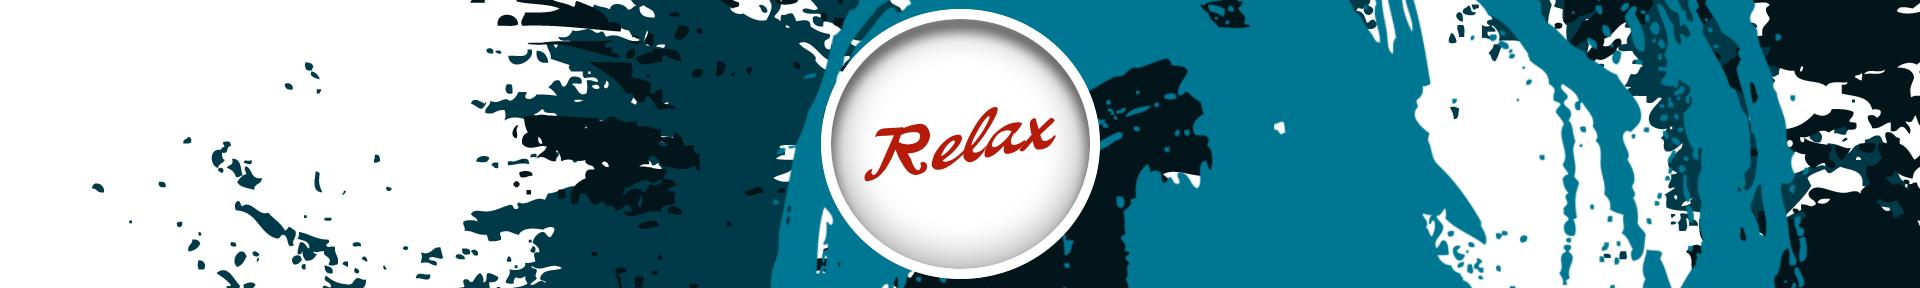 relax inkcartel.net